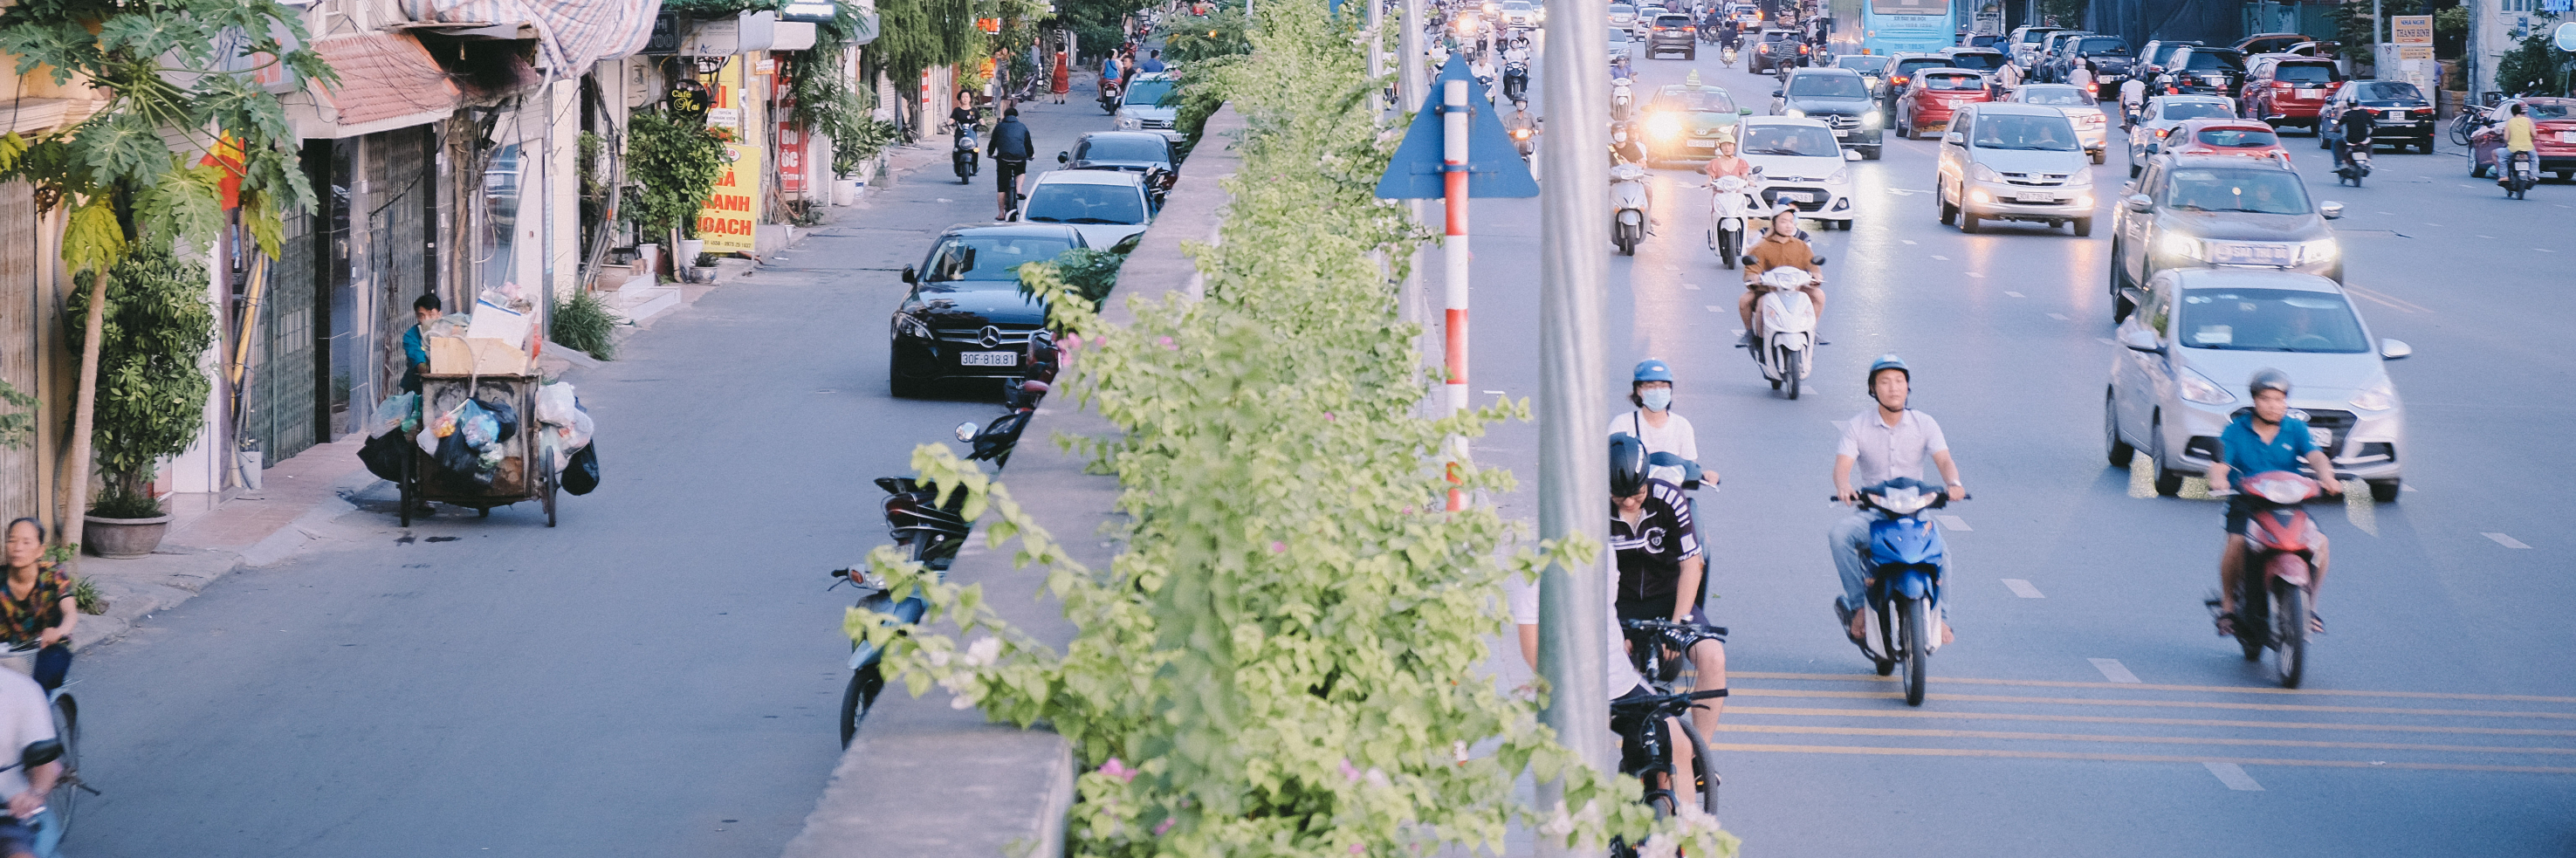 https://gody.vn/blog/tuananhhunre9193/post/ha-noi-thuong-tung-goc-pho-9050